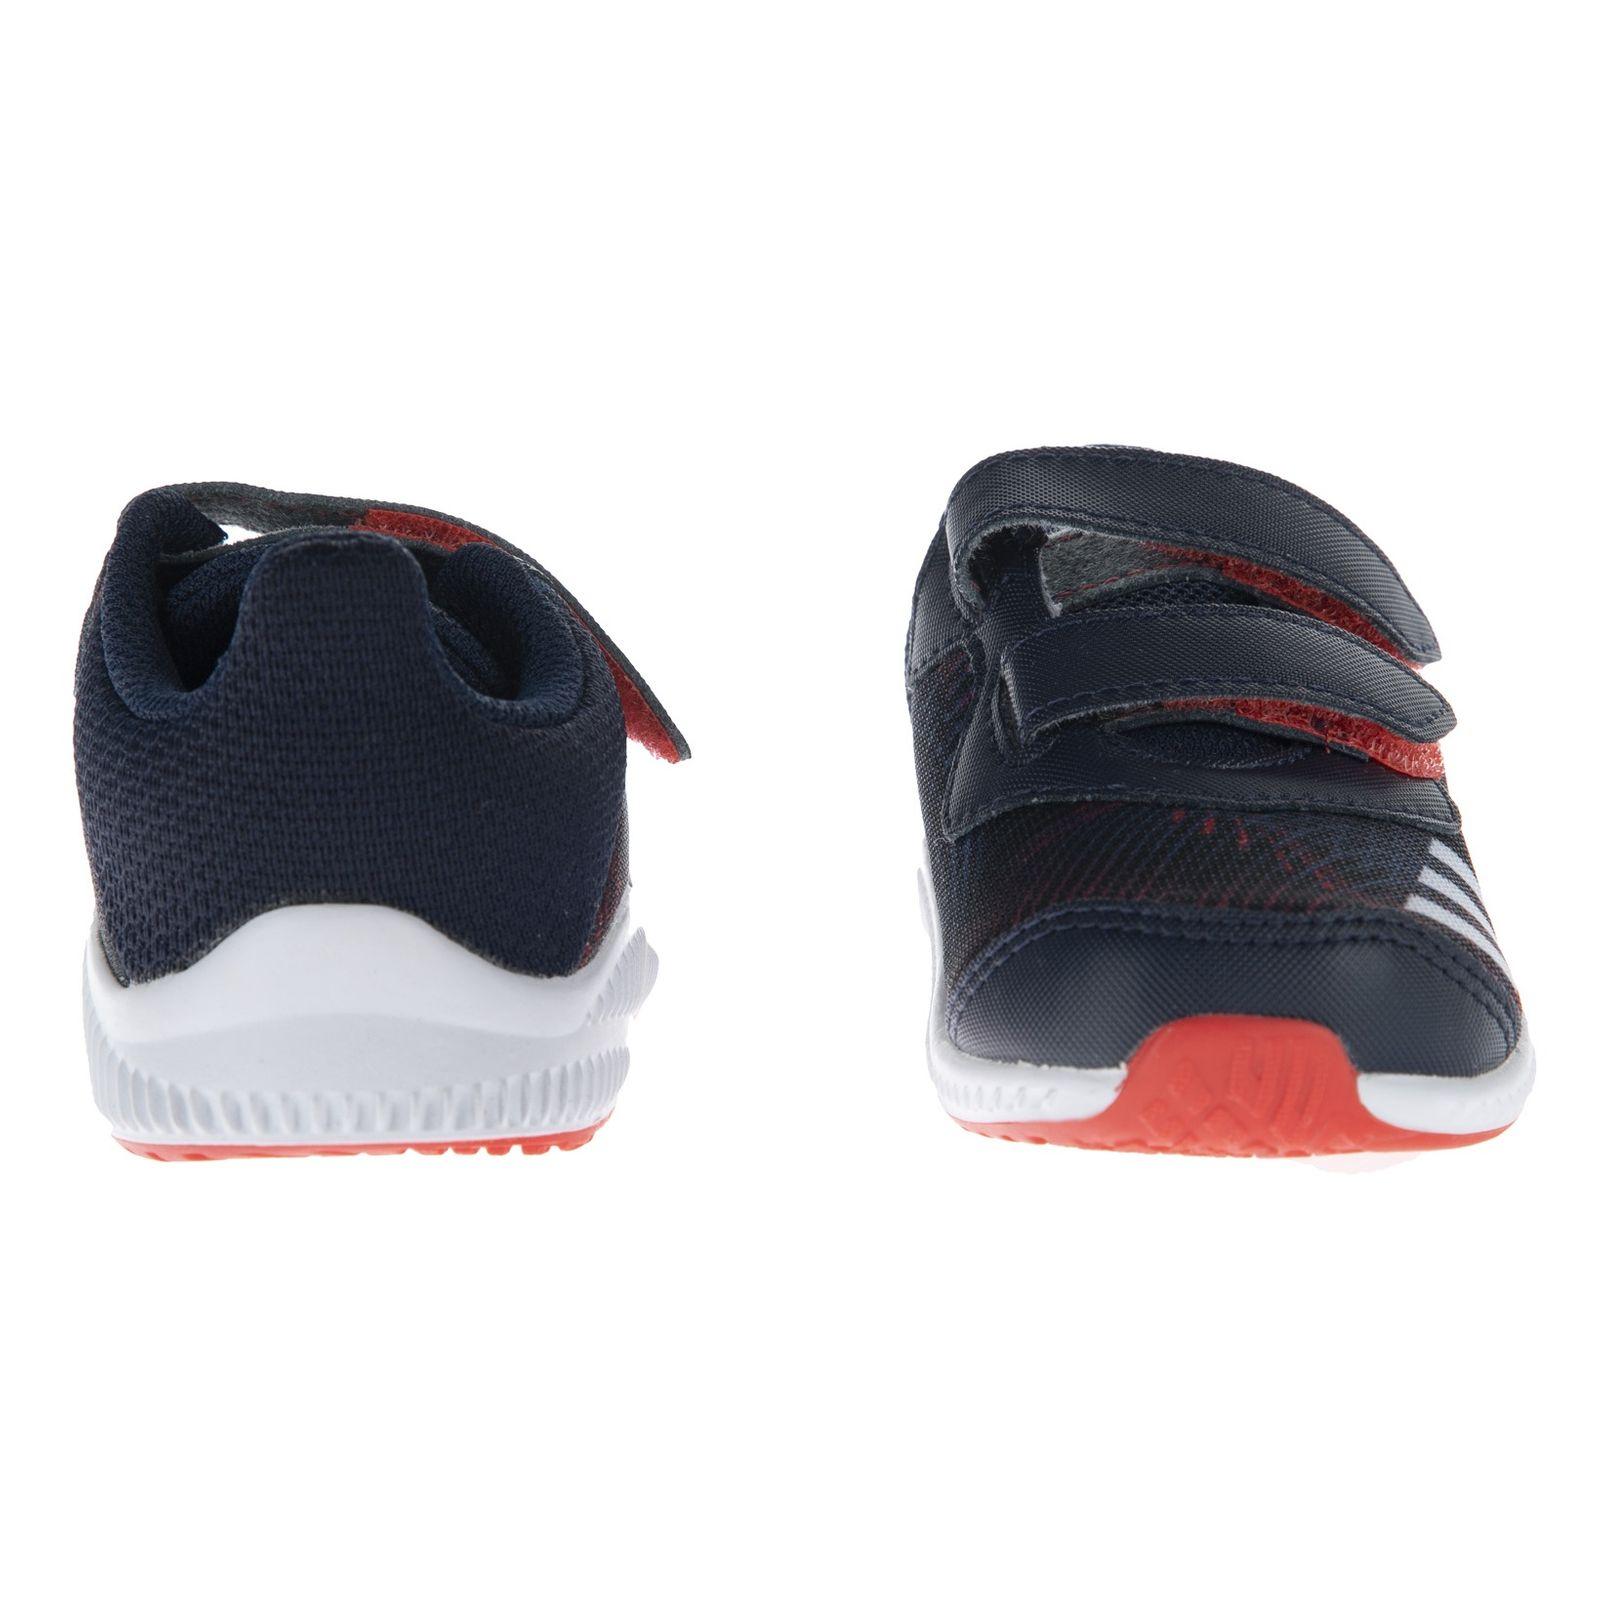 کفش مخصوص دویدن پسرانه آدیداس مدل Forta run CF -  - 4